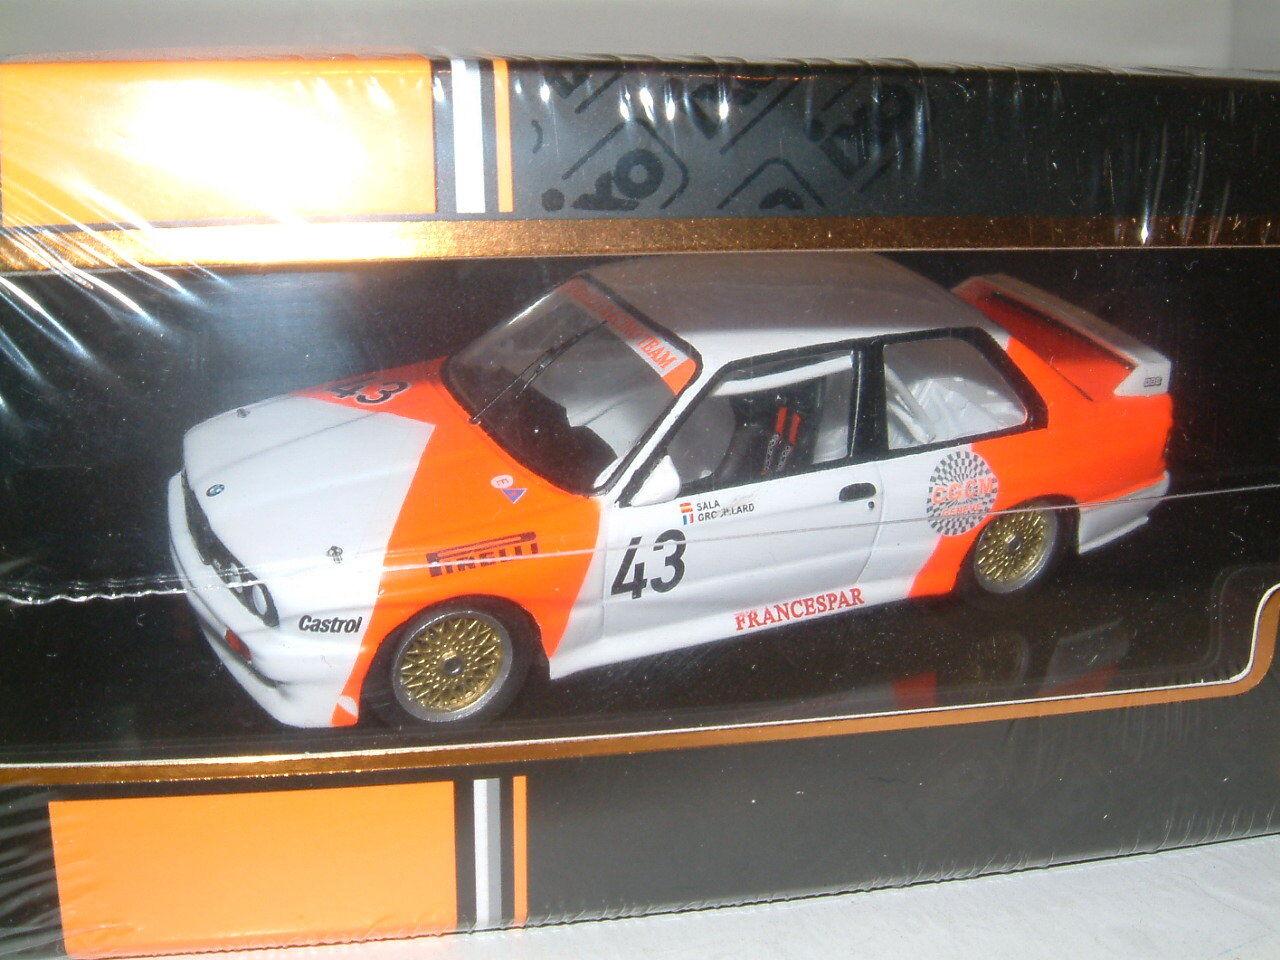 1 43 Ixo Ixo Ixo BMW M3 E30 1987 WTCC  43 Sala Grouillard 'Marlboro' Inc calcomanías  GTM127 ea6d1d